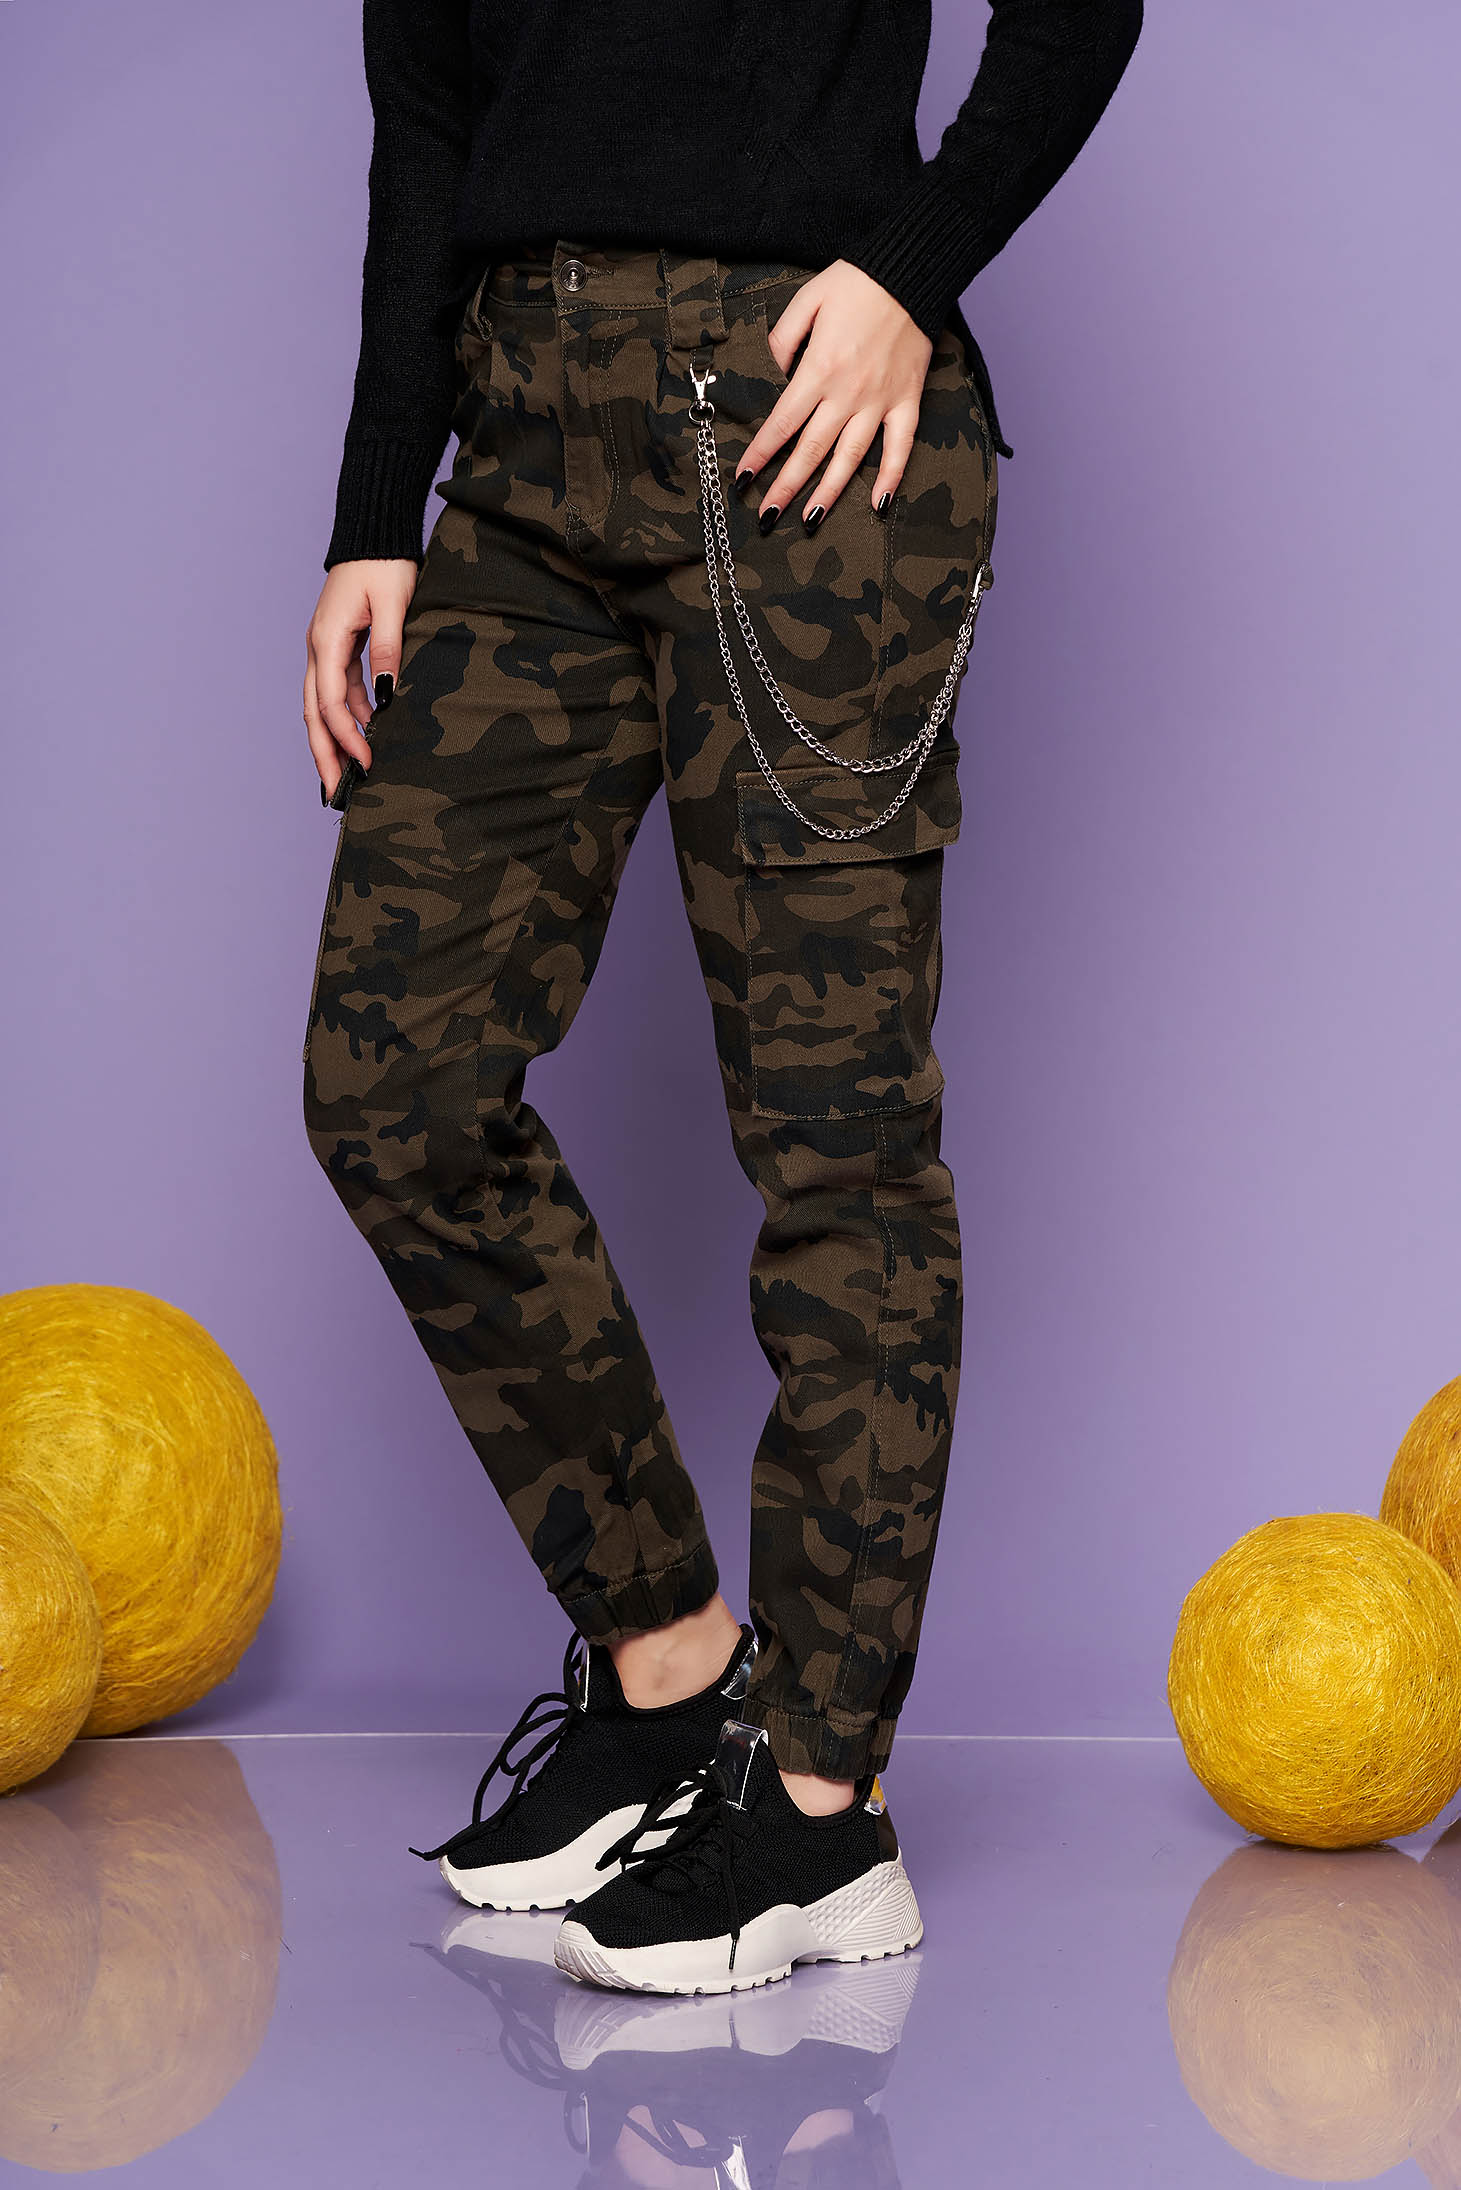 Darkgreen trousers casual cotton camouflage metallic chain accessory medium waist